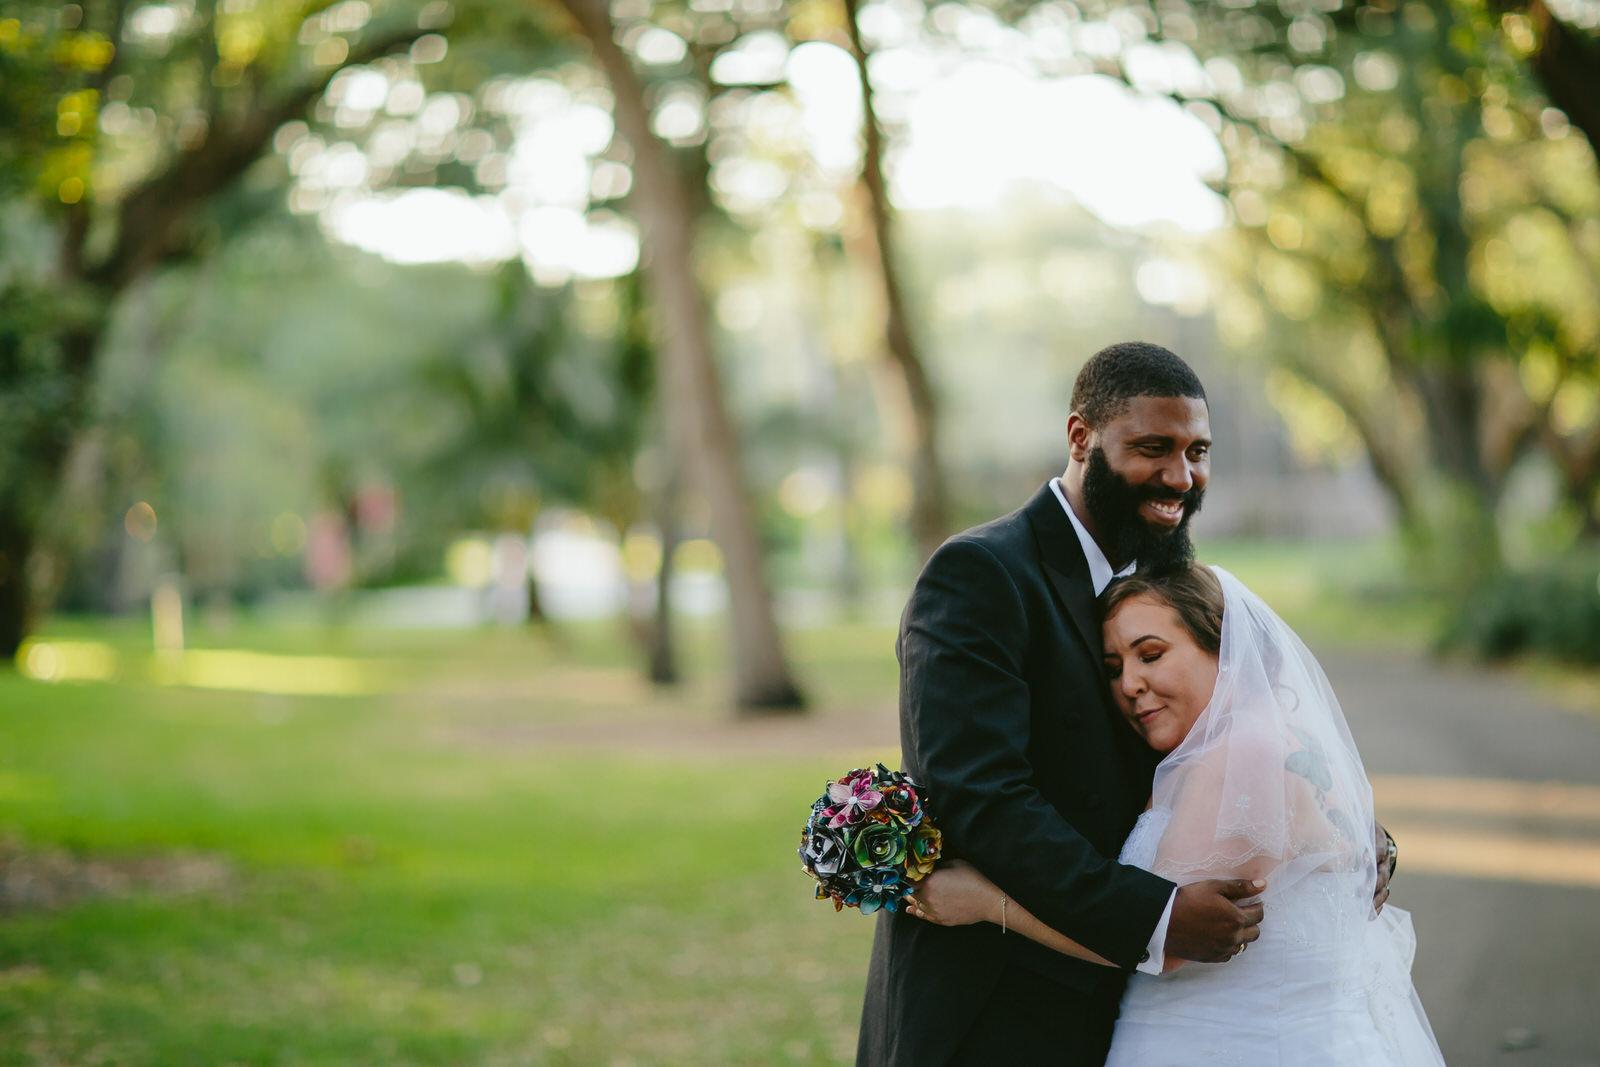 intimate-moments-wedding-photography-florida-weddings-tiny-house-photo.jpg